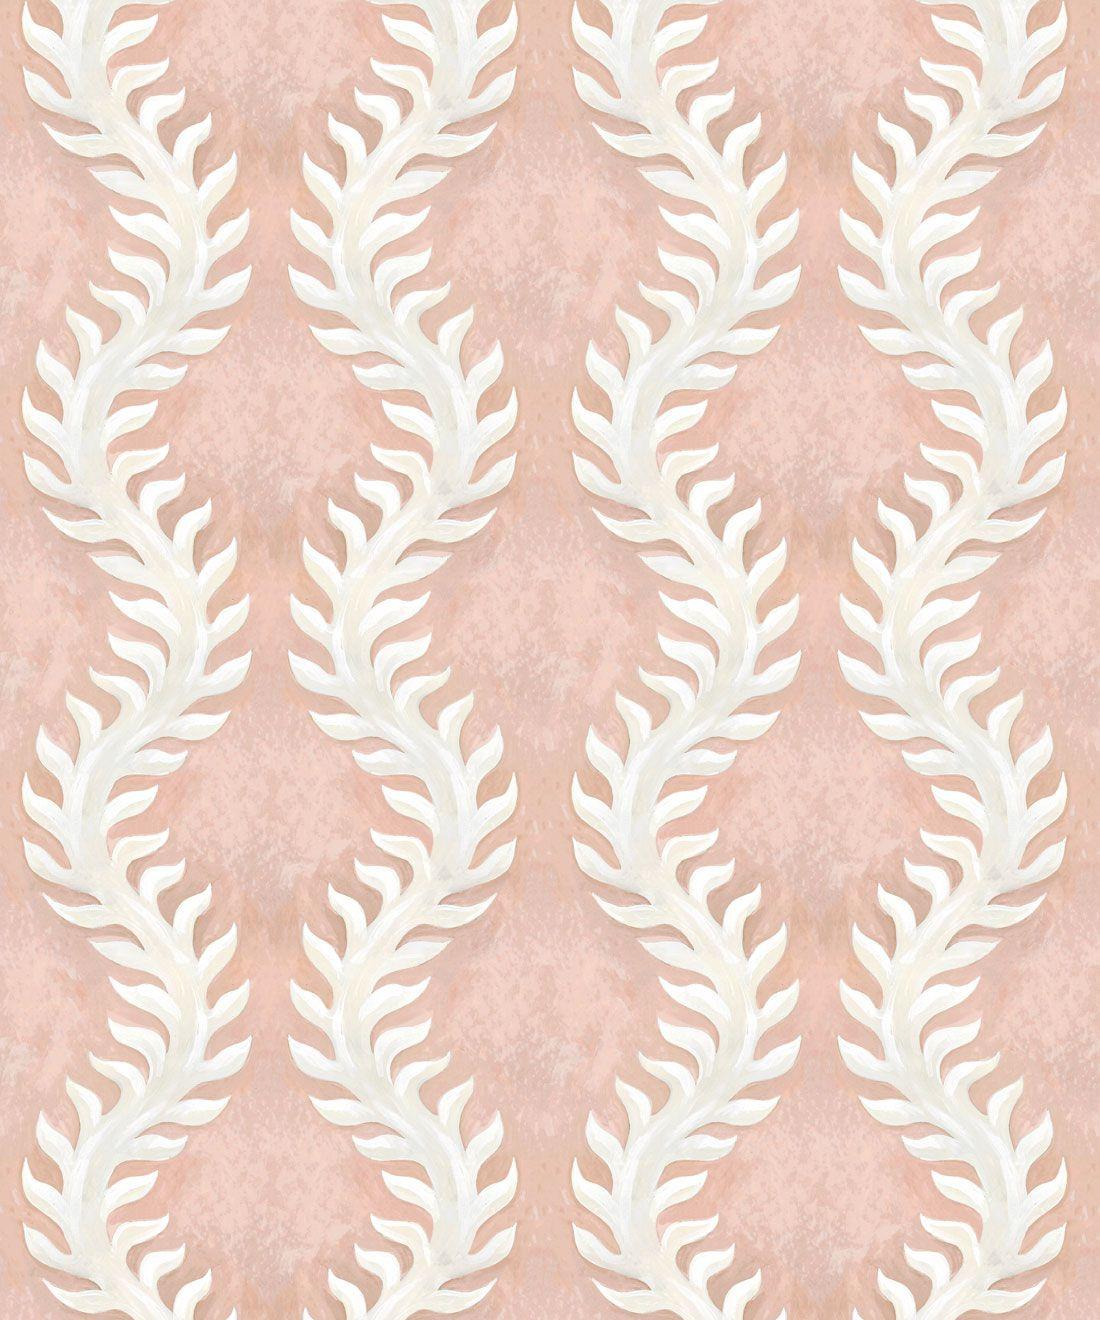 Fern Wallpaper • Pink Wallpaper •Swatch